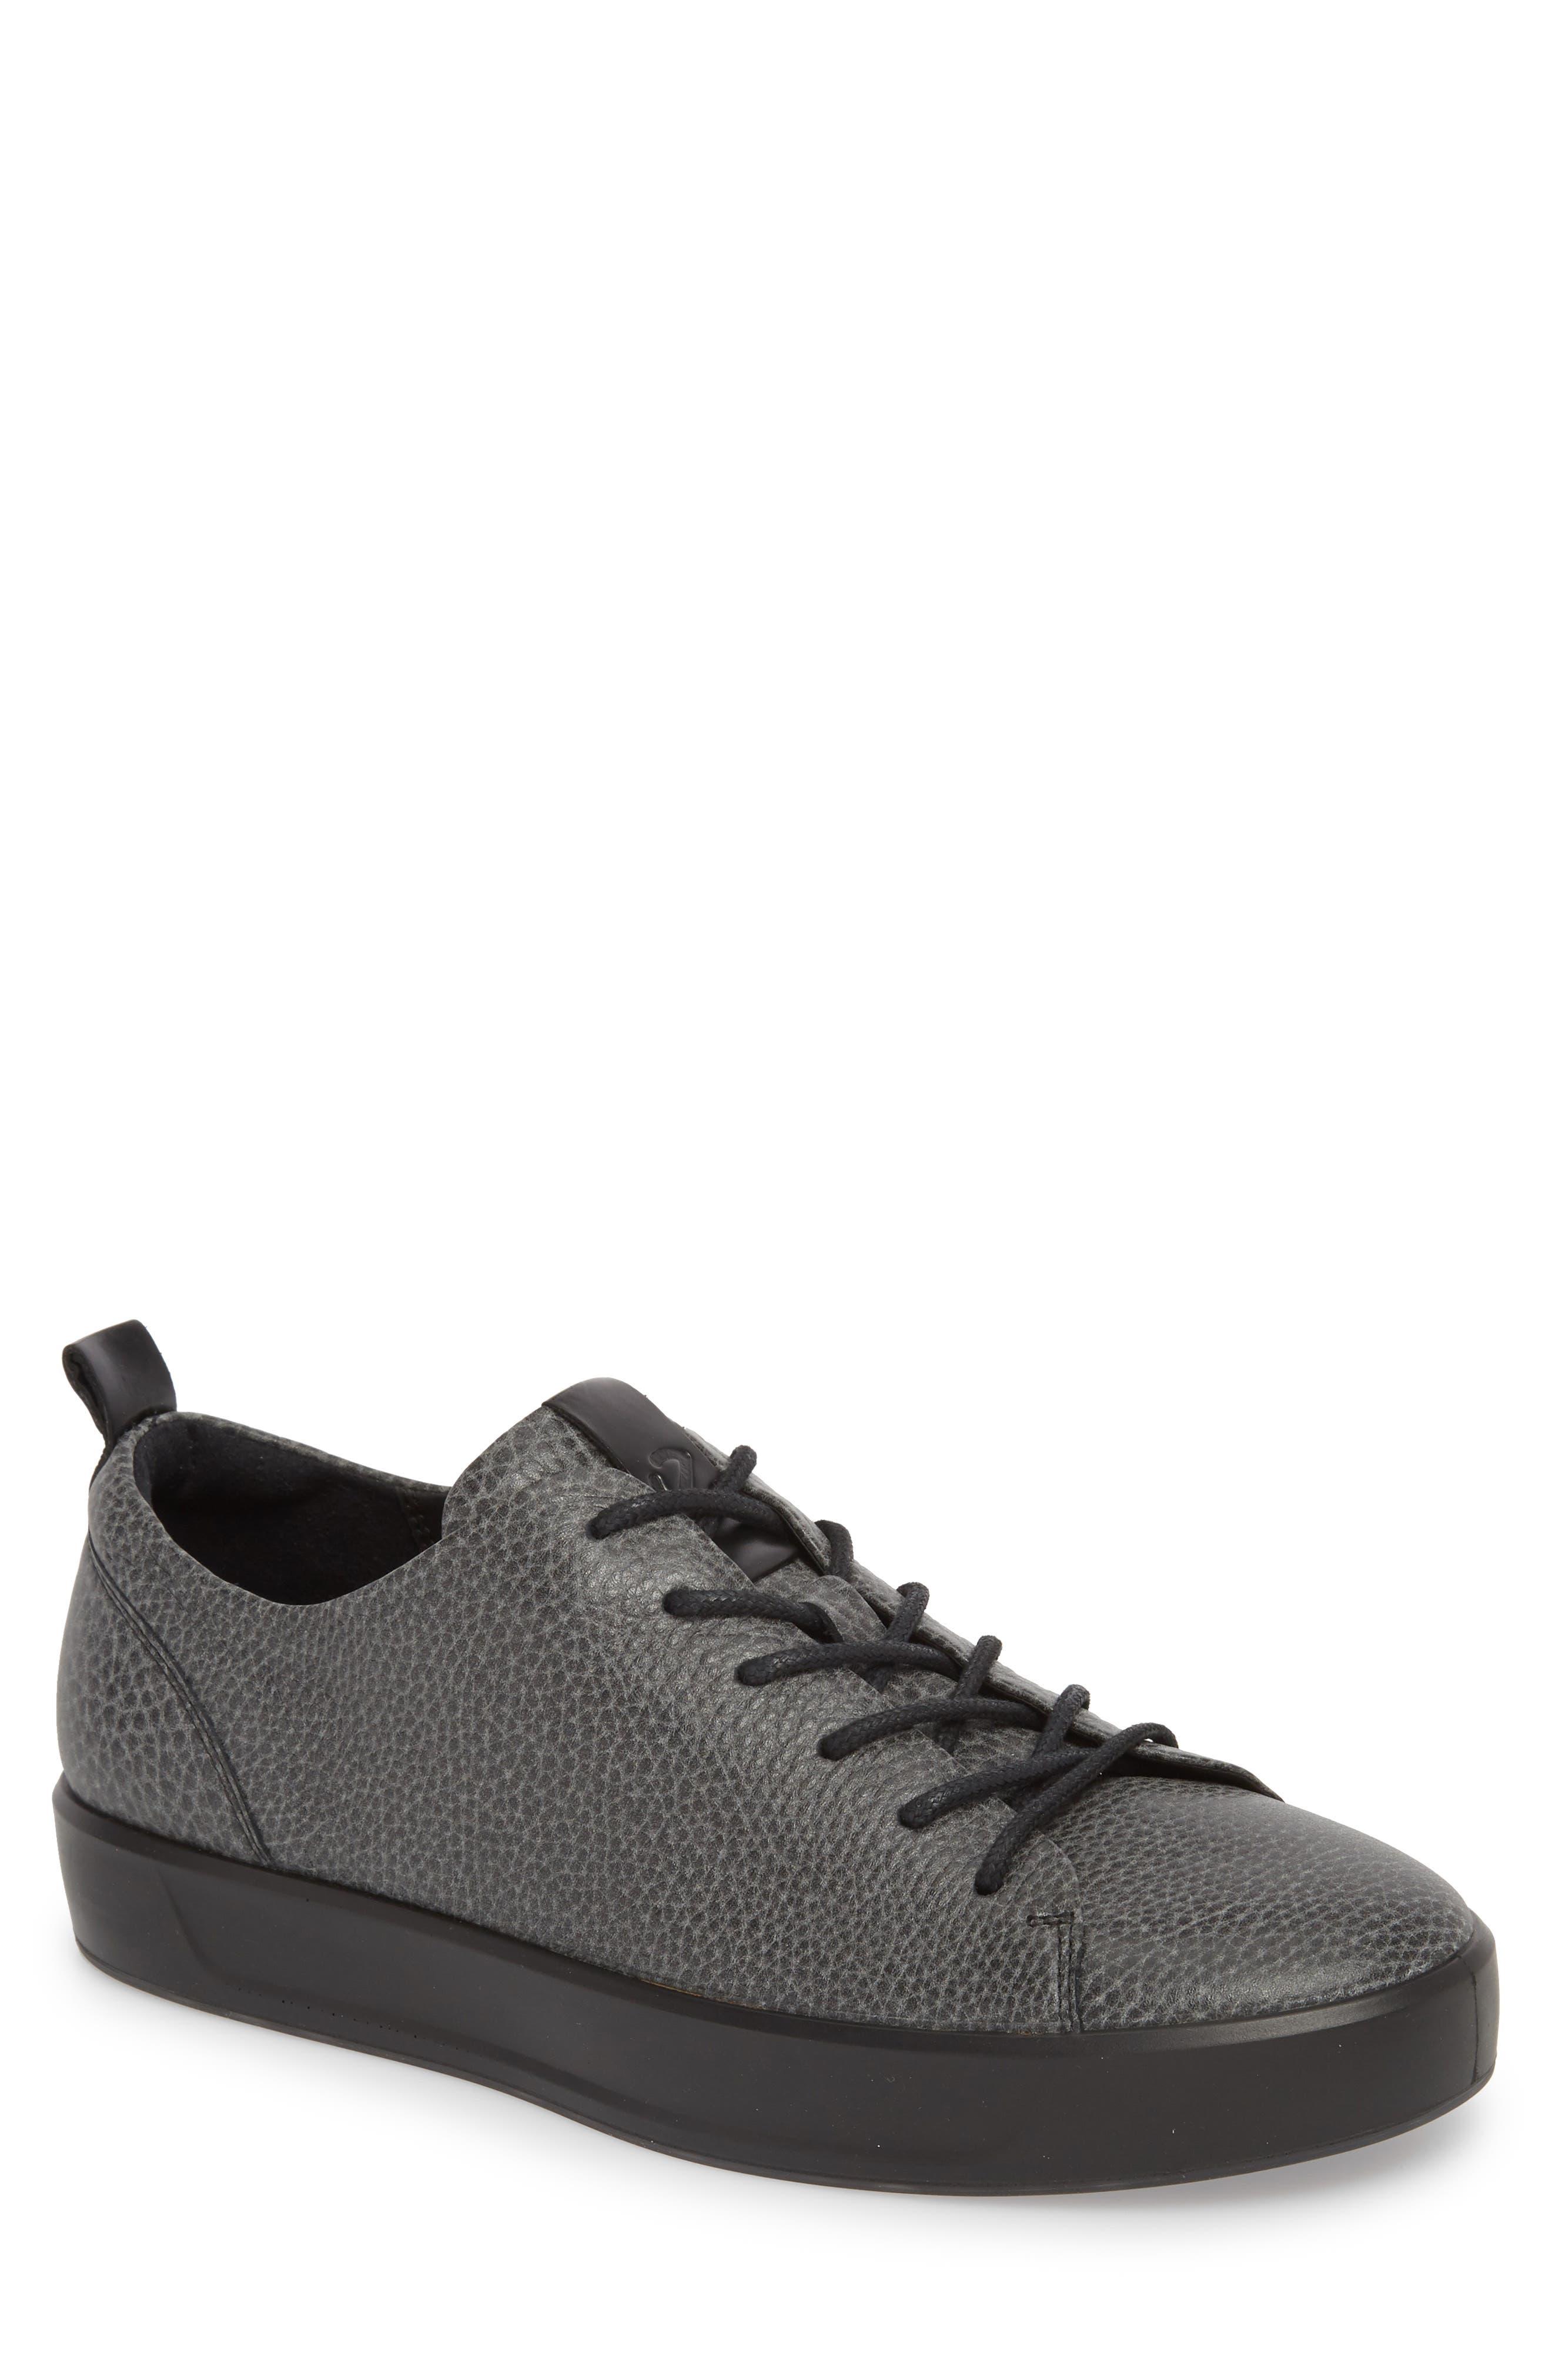 Soft 8 Tie II Low Top Sneaker,                         Main,                         color, BLACK